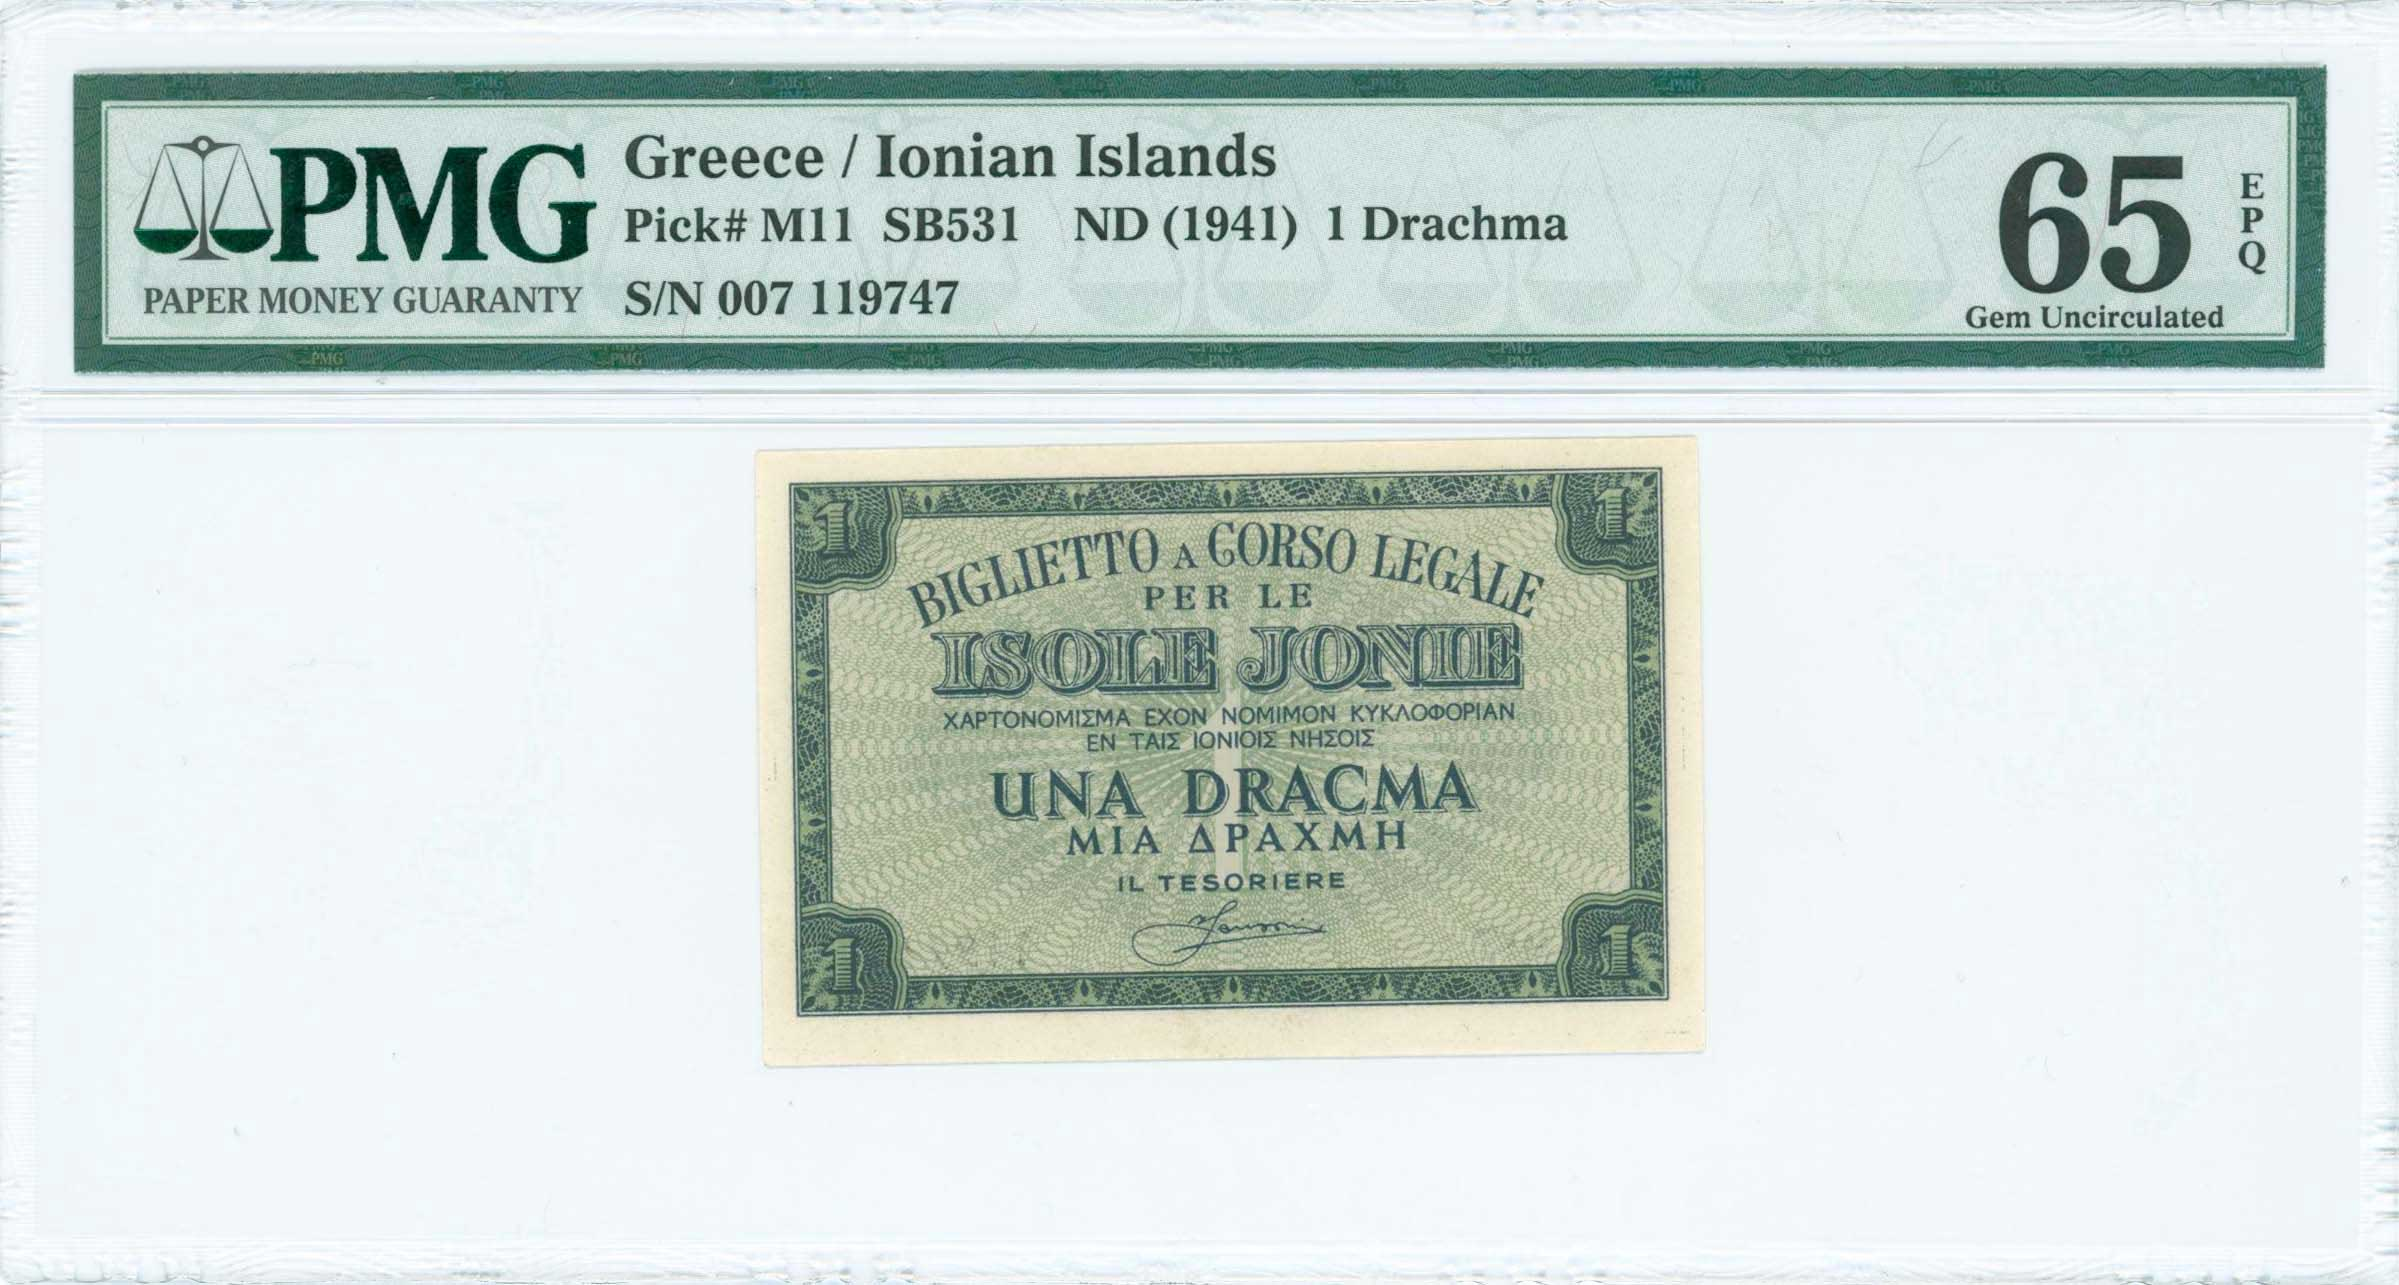 Lot 6741 - -  PAPER MONEY - BANKNOTES italian occupation -  A. Karamitsos Public & Live Internet Auction 671 (Part A)